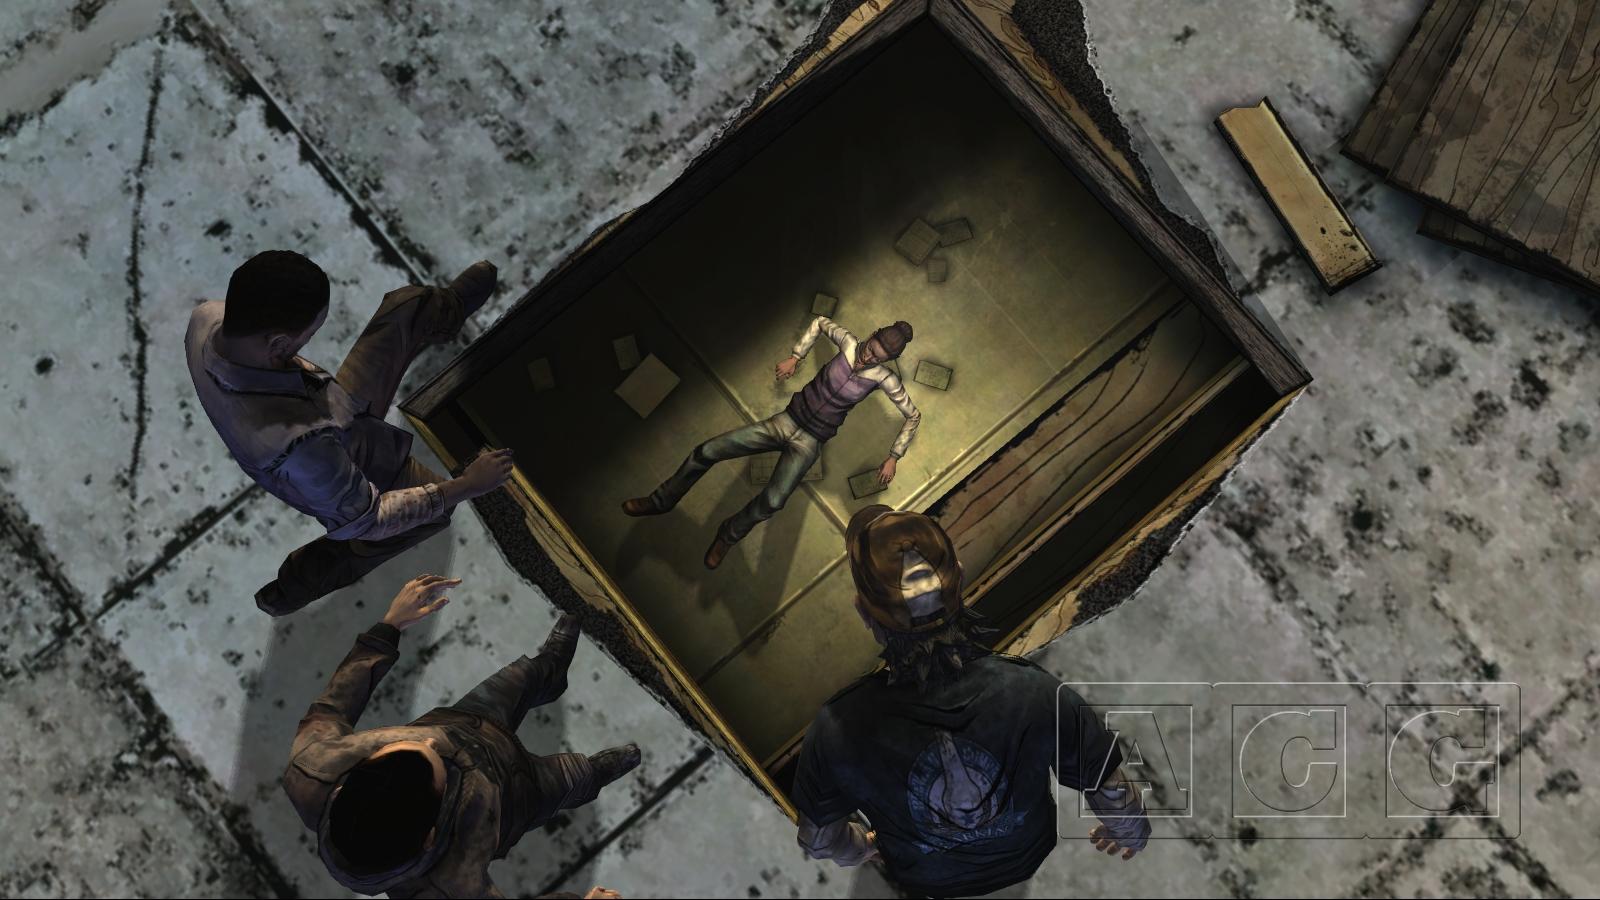 The Walking Dead: Season 1 Episode 5: No Time Left